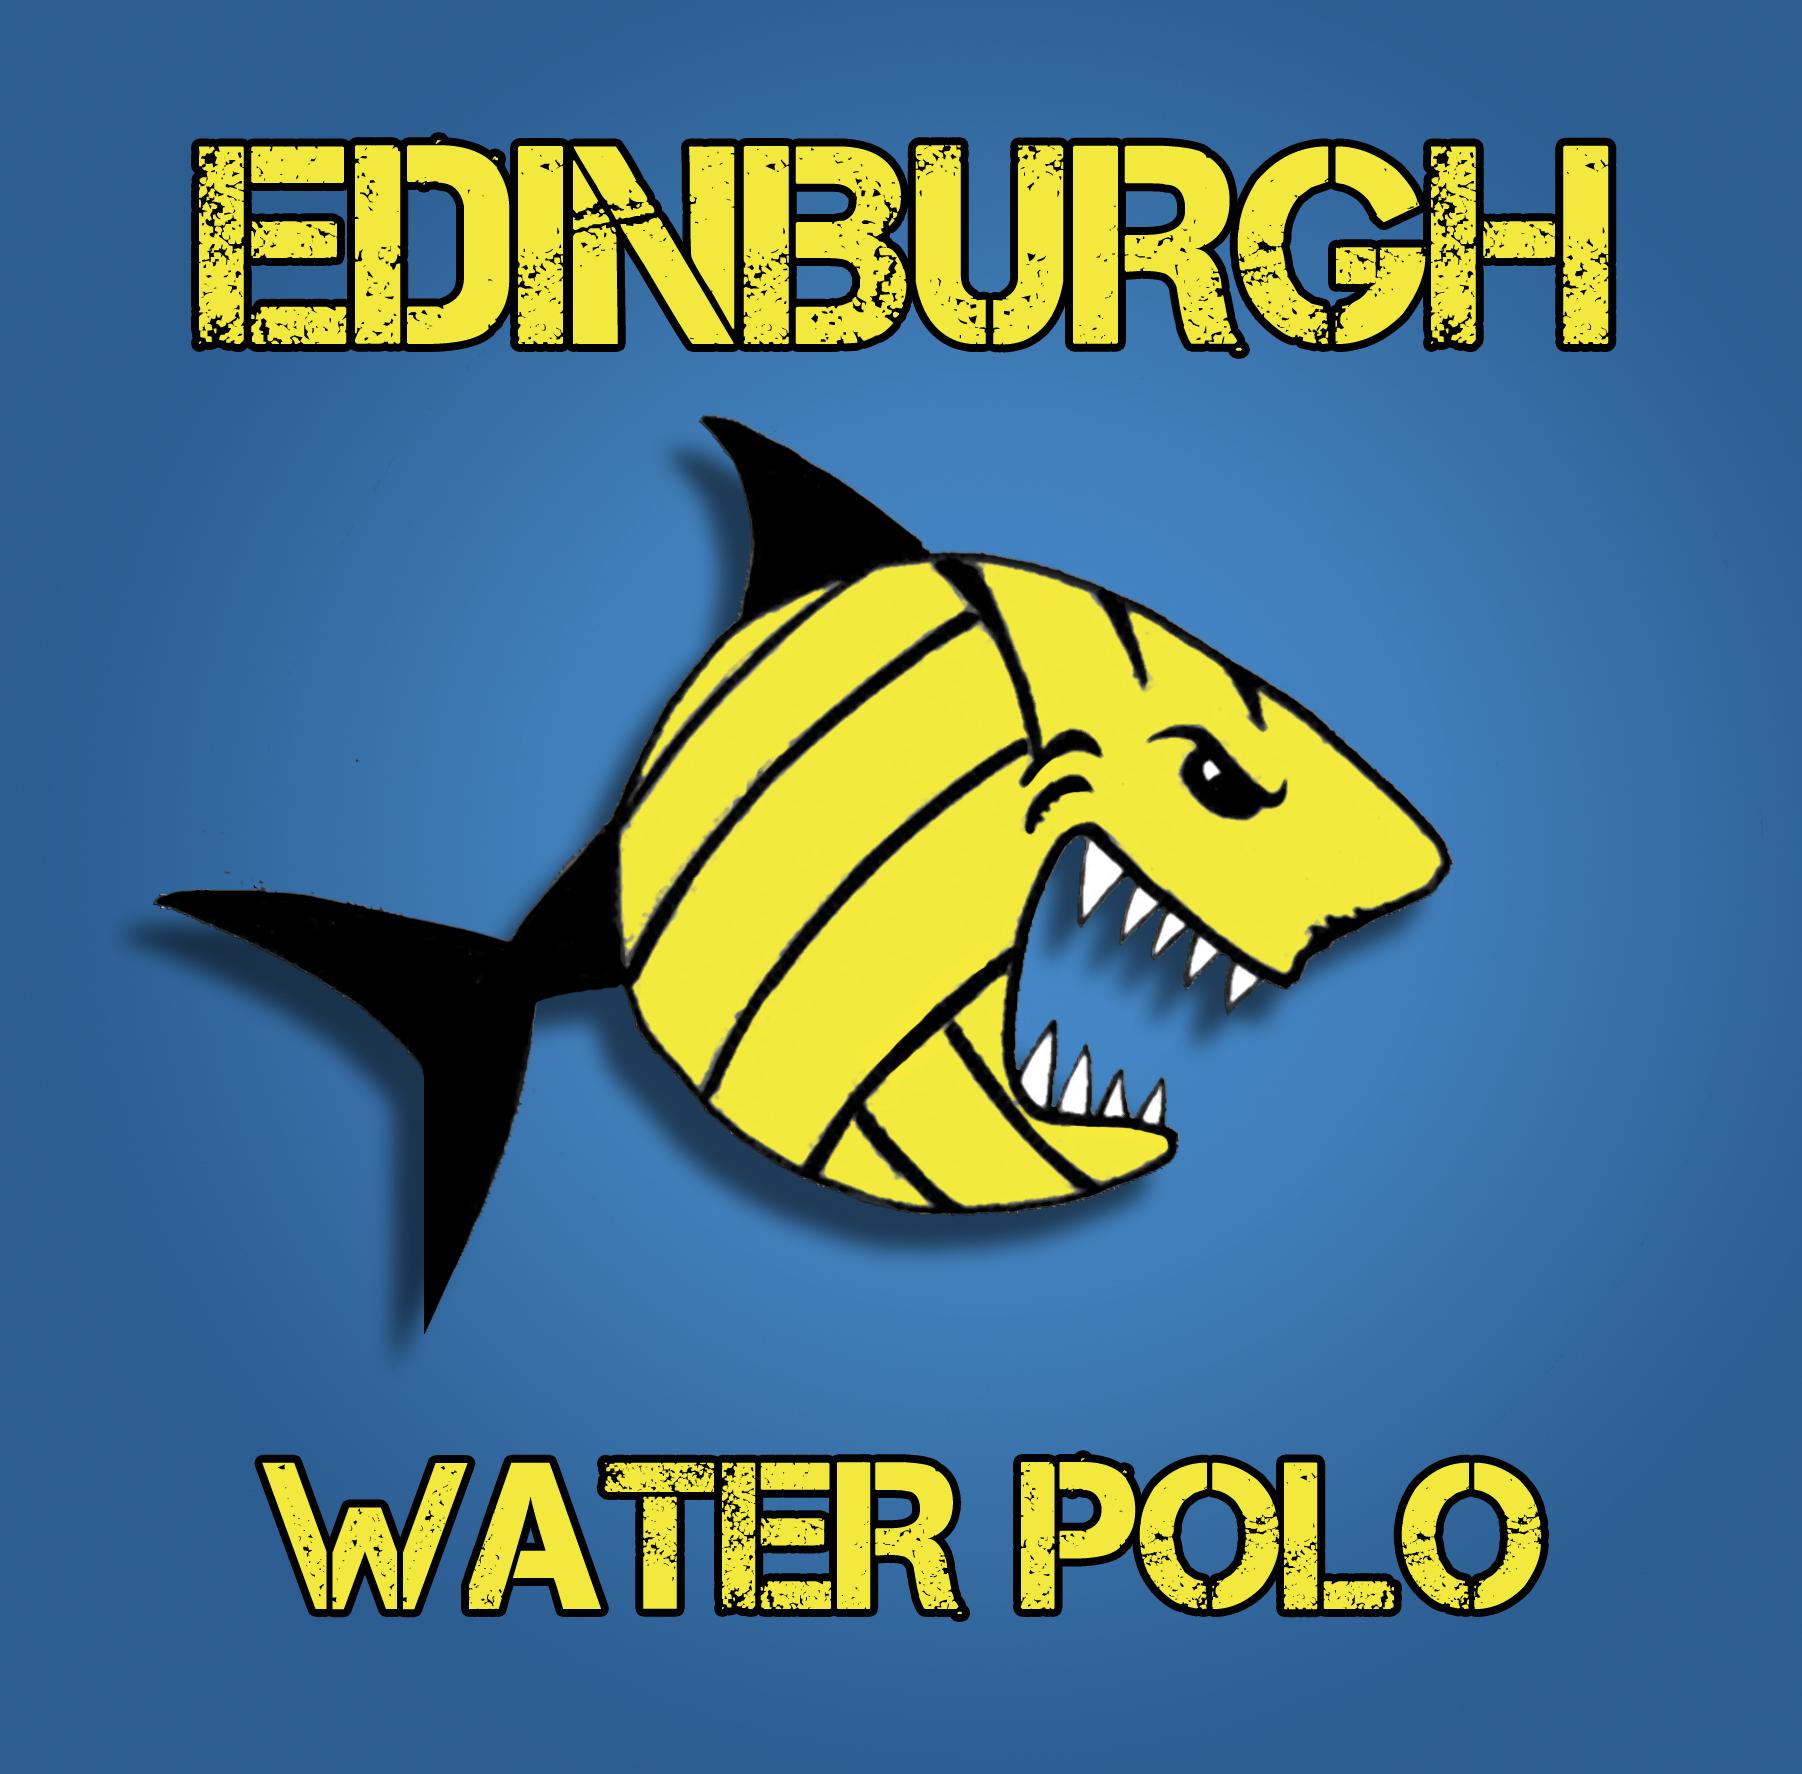 Edinburgh Water Polo Logo The Portfolio Of Ross Hoddinott